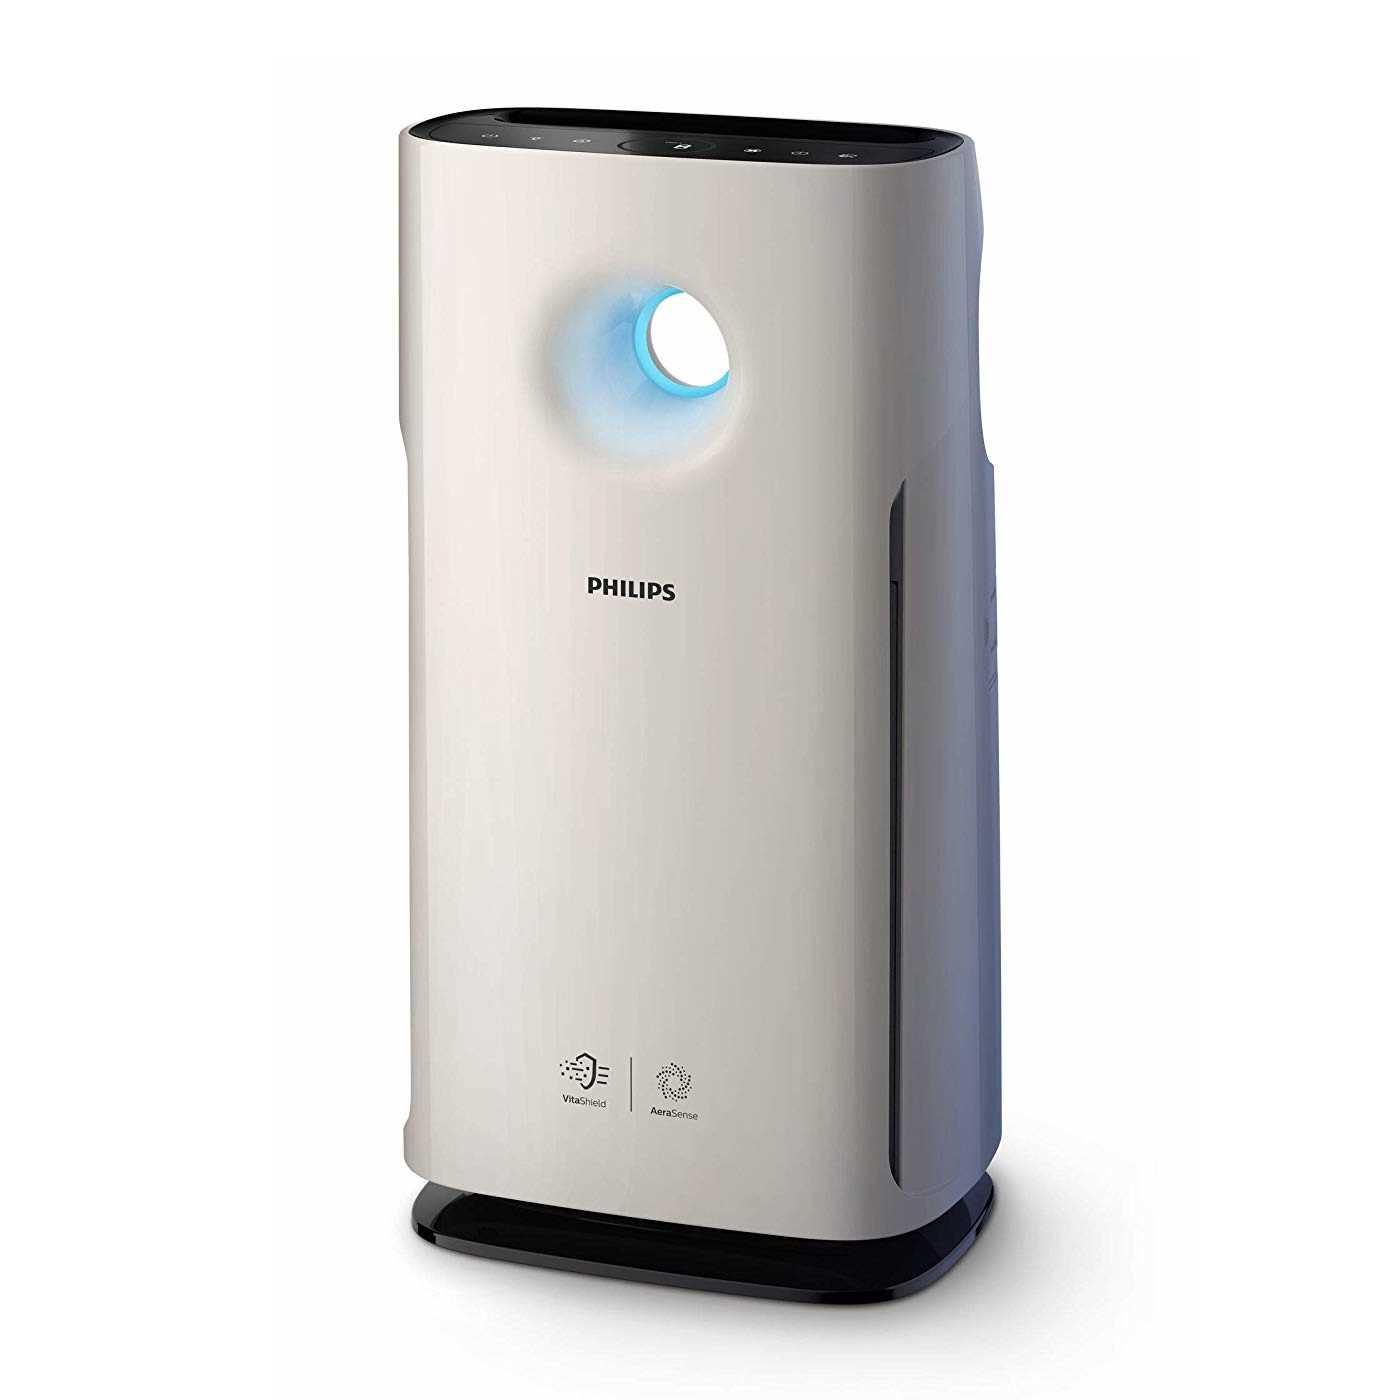 Philips AC3257 Room Air Purifier